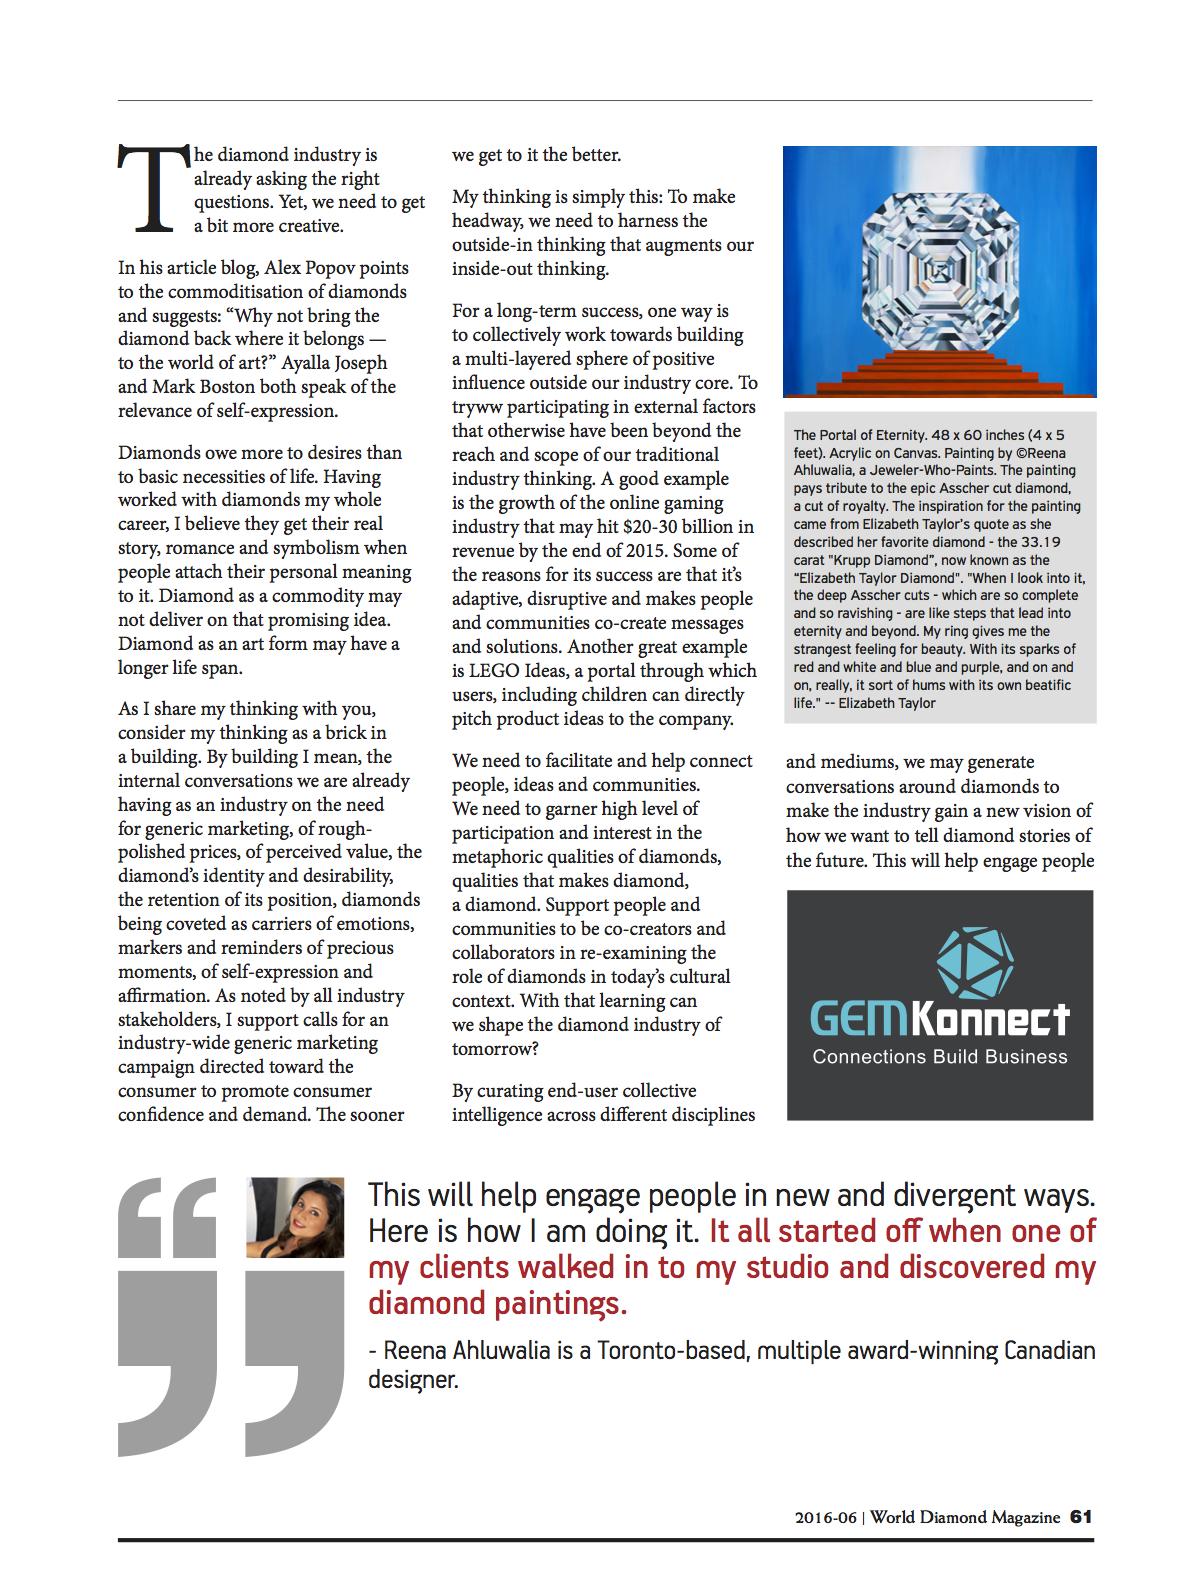 World Diamond Mark_Reena Ahluwalia Interview_Page2